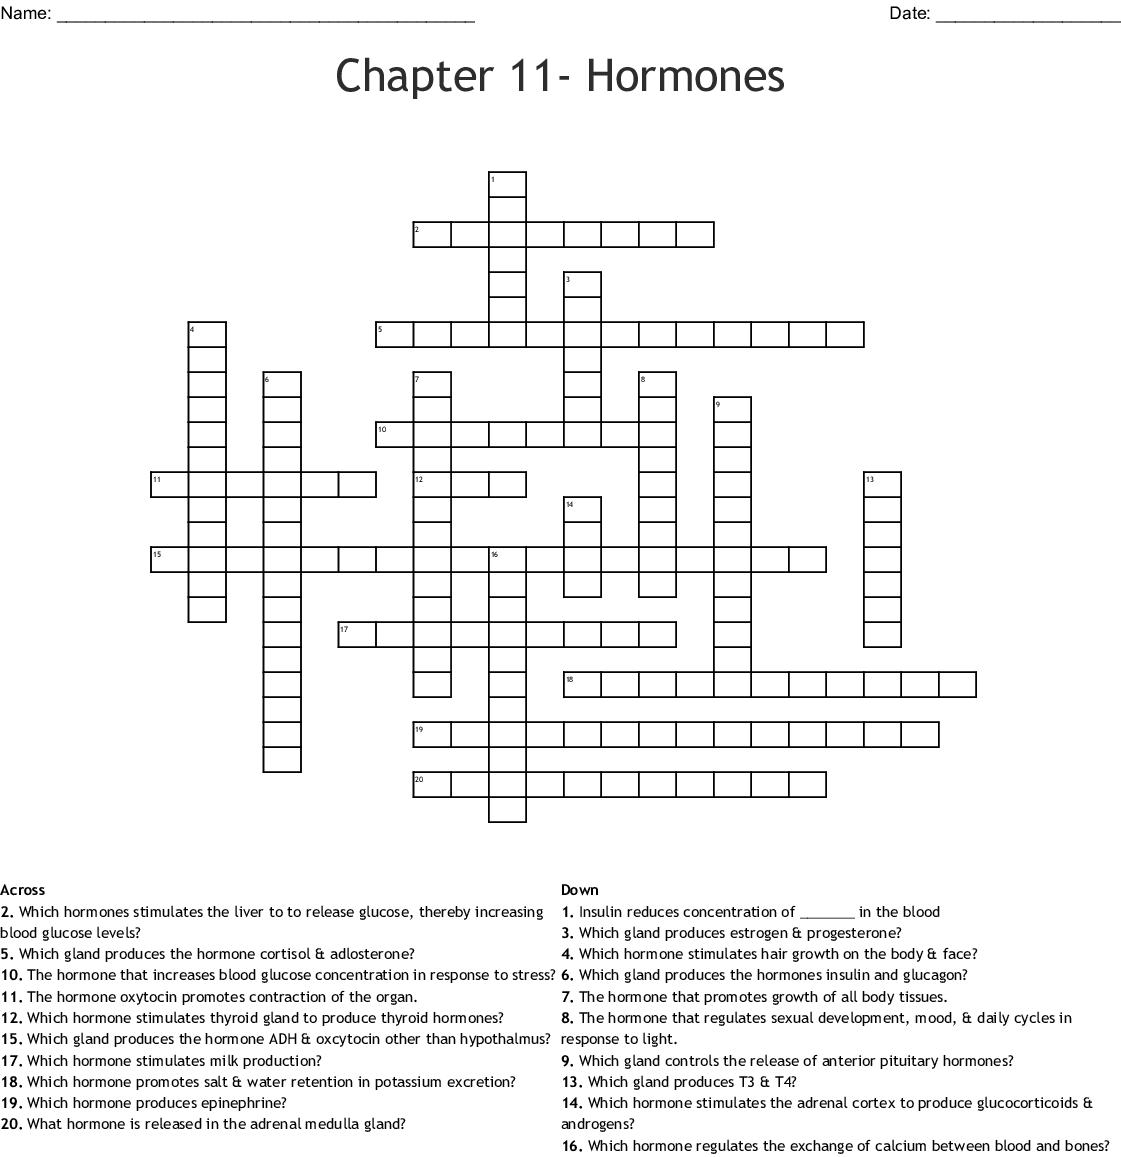 Answer Key Body Systems Matching Worksheet Answers